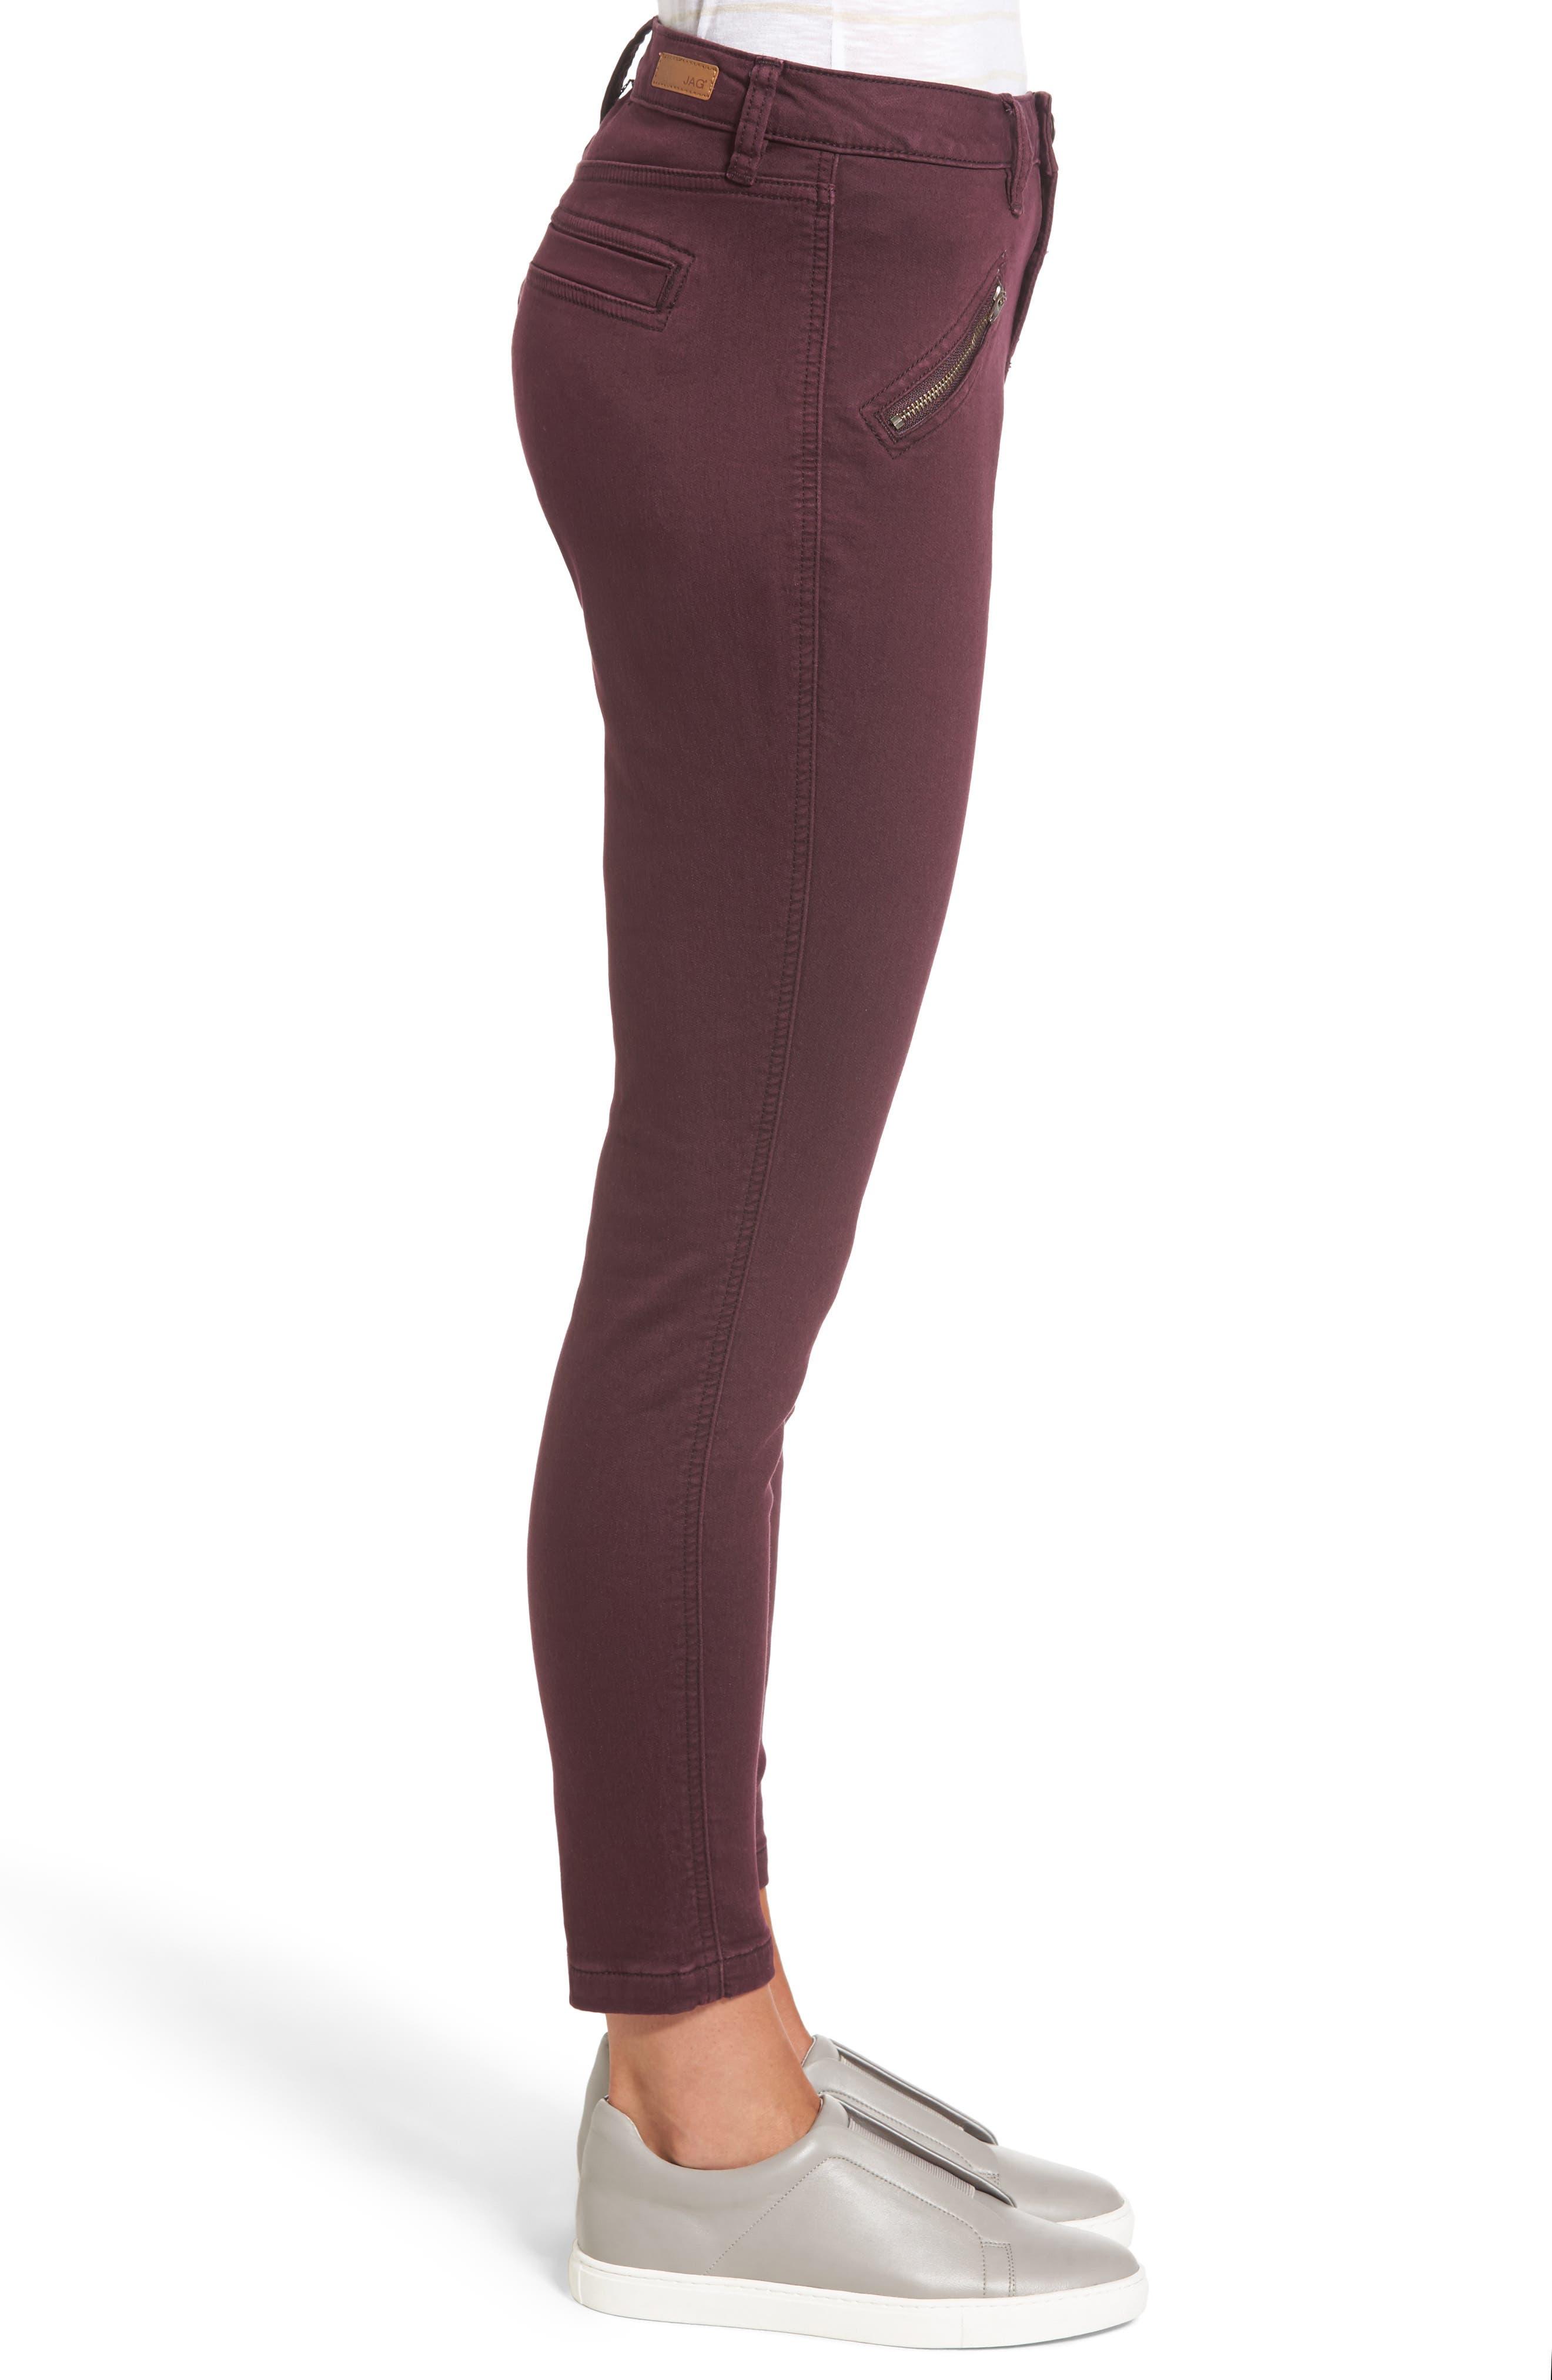 Alternate Image 3  - Jag Jeans Ryan Knit Skinny Jeans (Plum Noir)